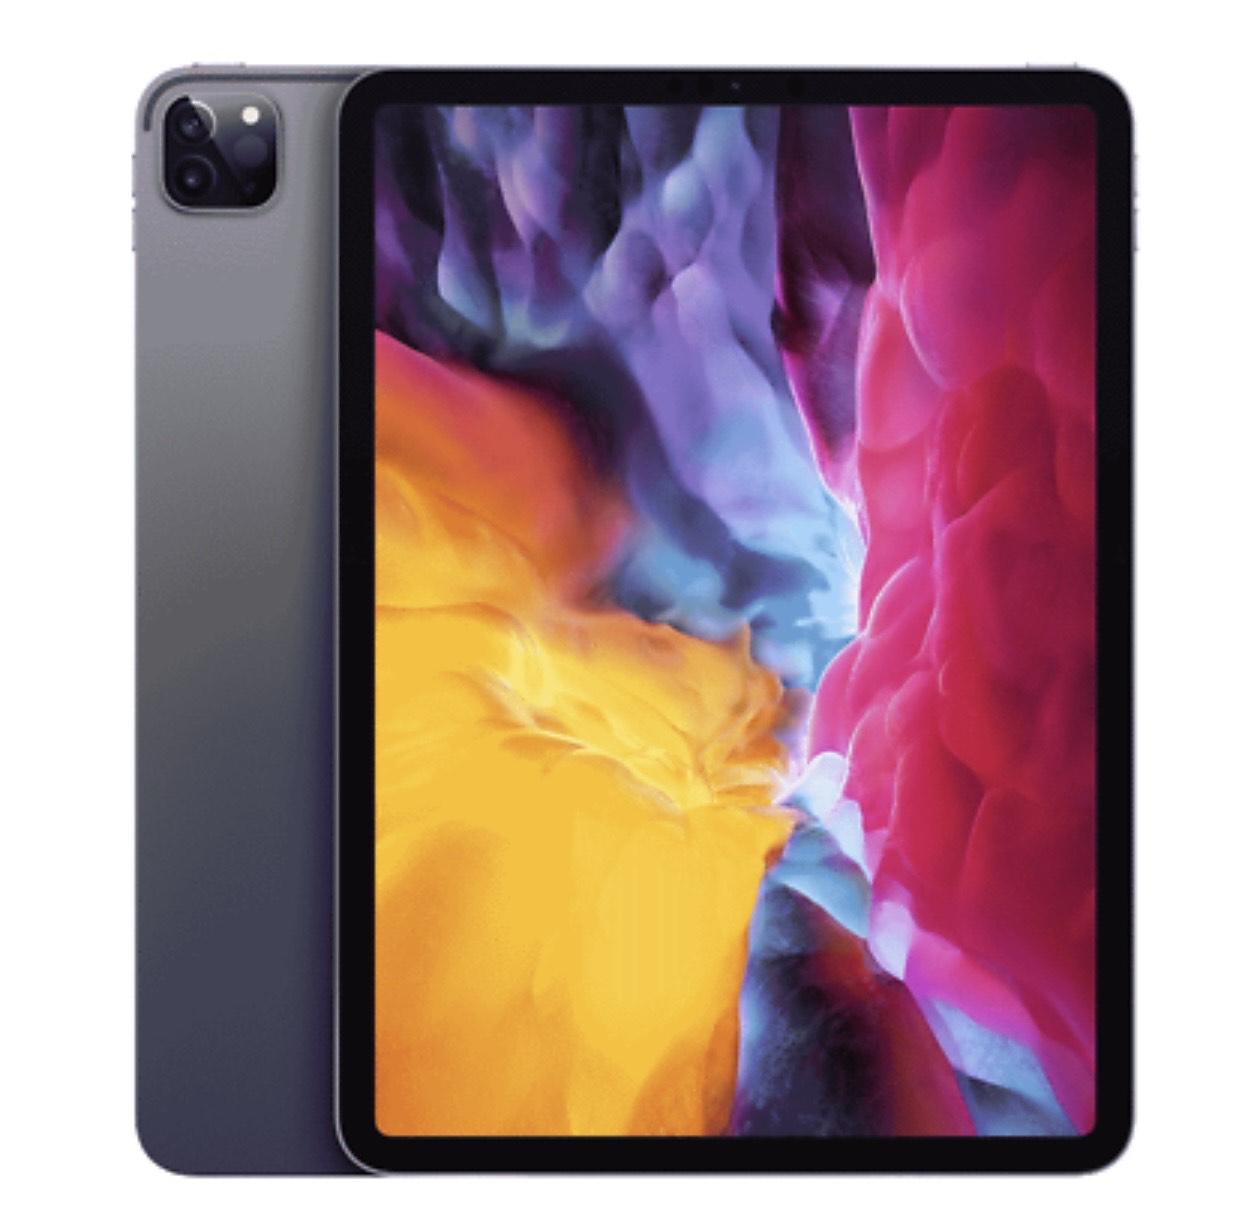 "Apple iPad Pro 11"" 2020 - WiFi - 128GB - Space Grau - NEU (differenzbesteuert)"